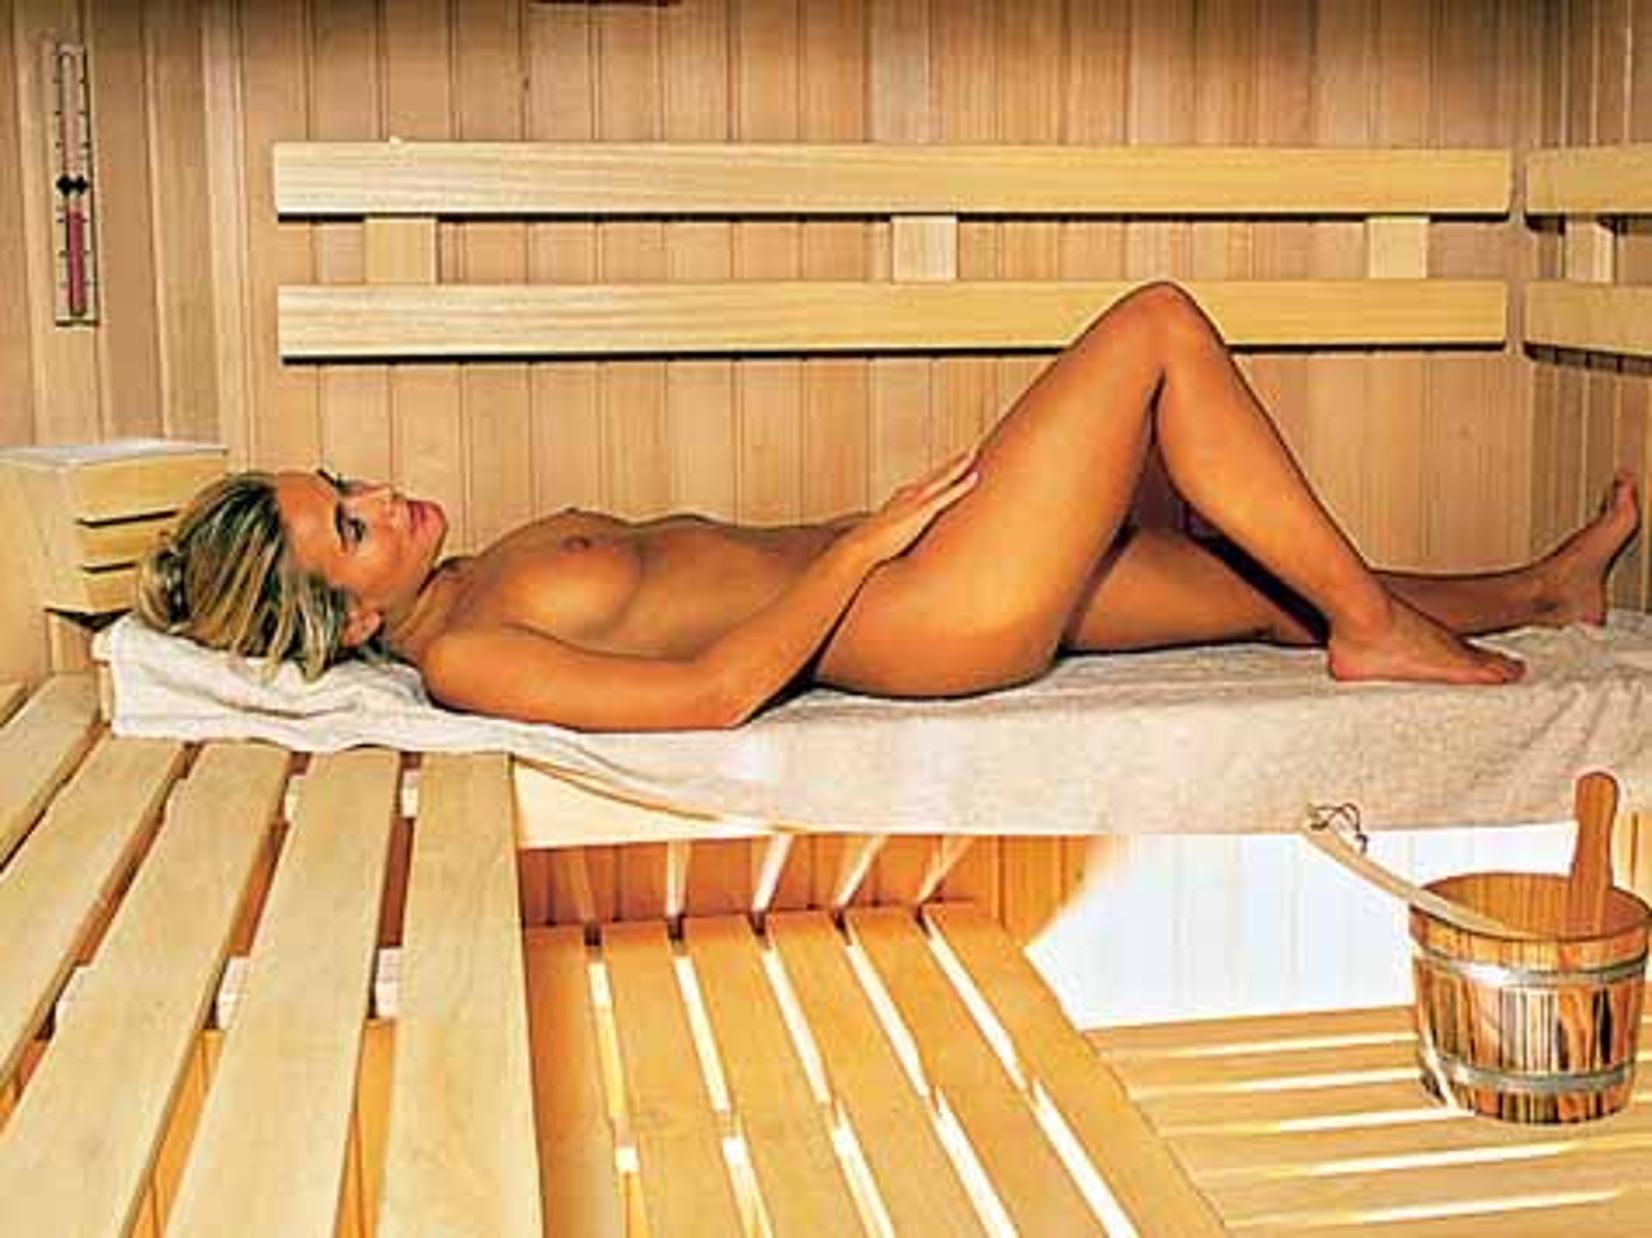 Getting naked in austrian saunas